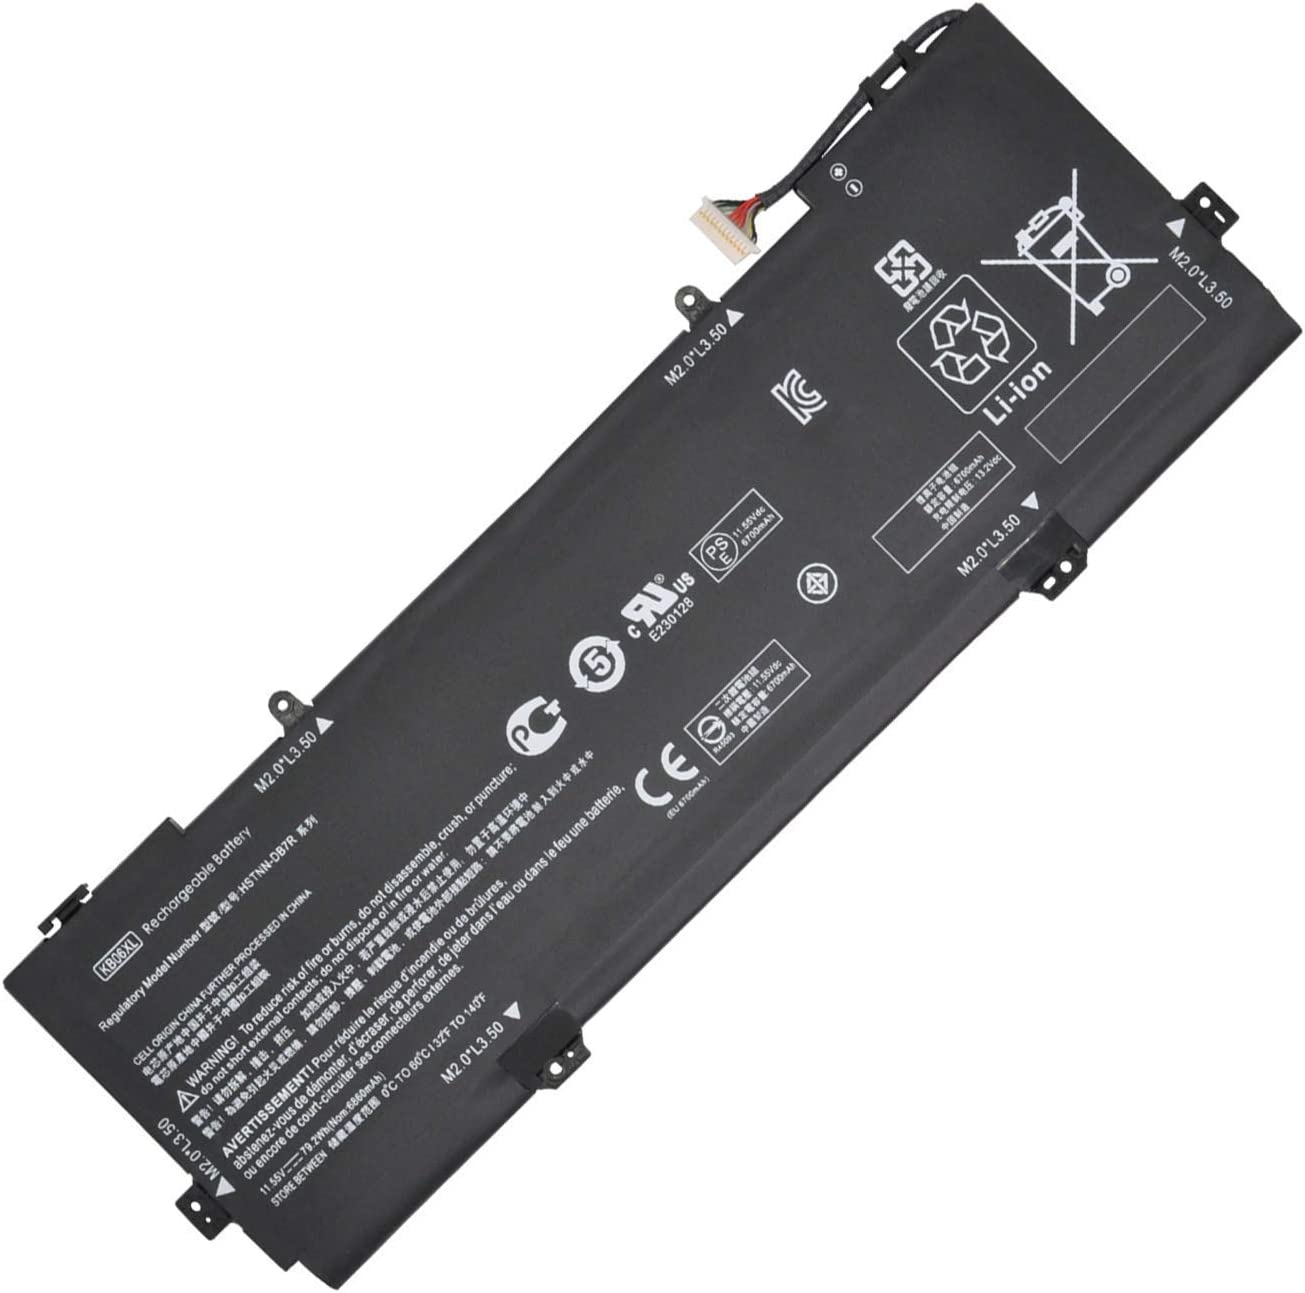 Hubei KB06XL HSTNN-DB7R TPN-Q179 902401-2C1 902499-855 Replacement Laptop Battery for Battery HP X360 15-BL002XX Series Z6K96EA Z6K97EA Z6K99EA Z6L00EA Z6L01EA Z6L02EA (11.55V 79.2Wh)